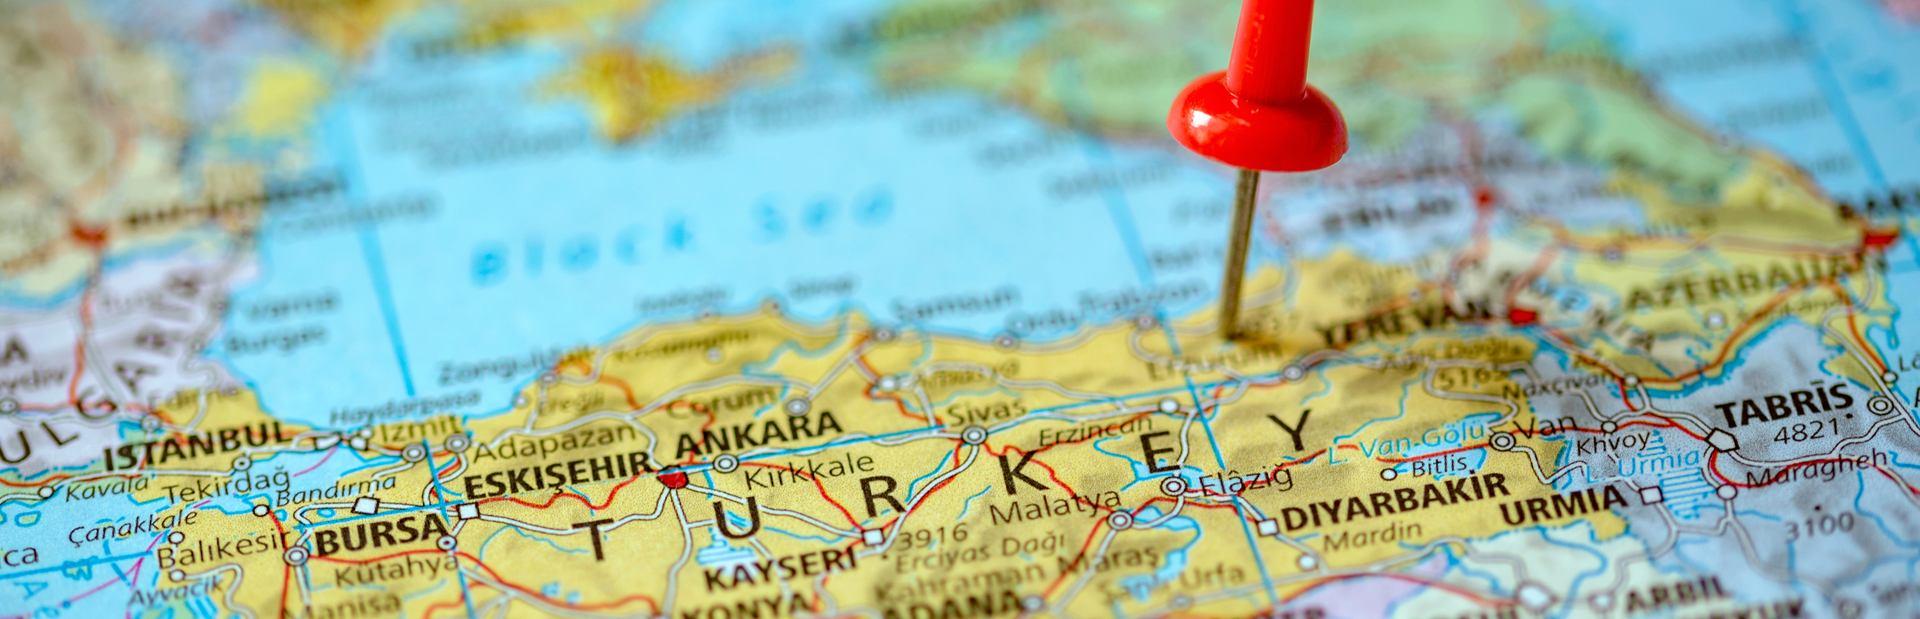 Turkey interactive map